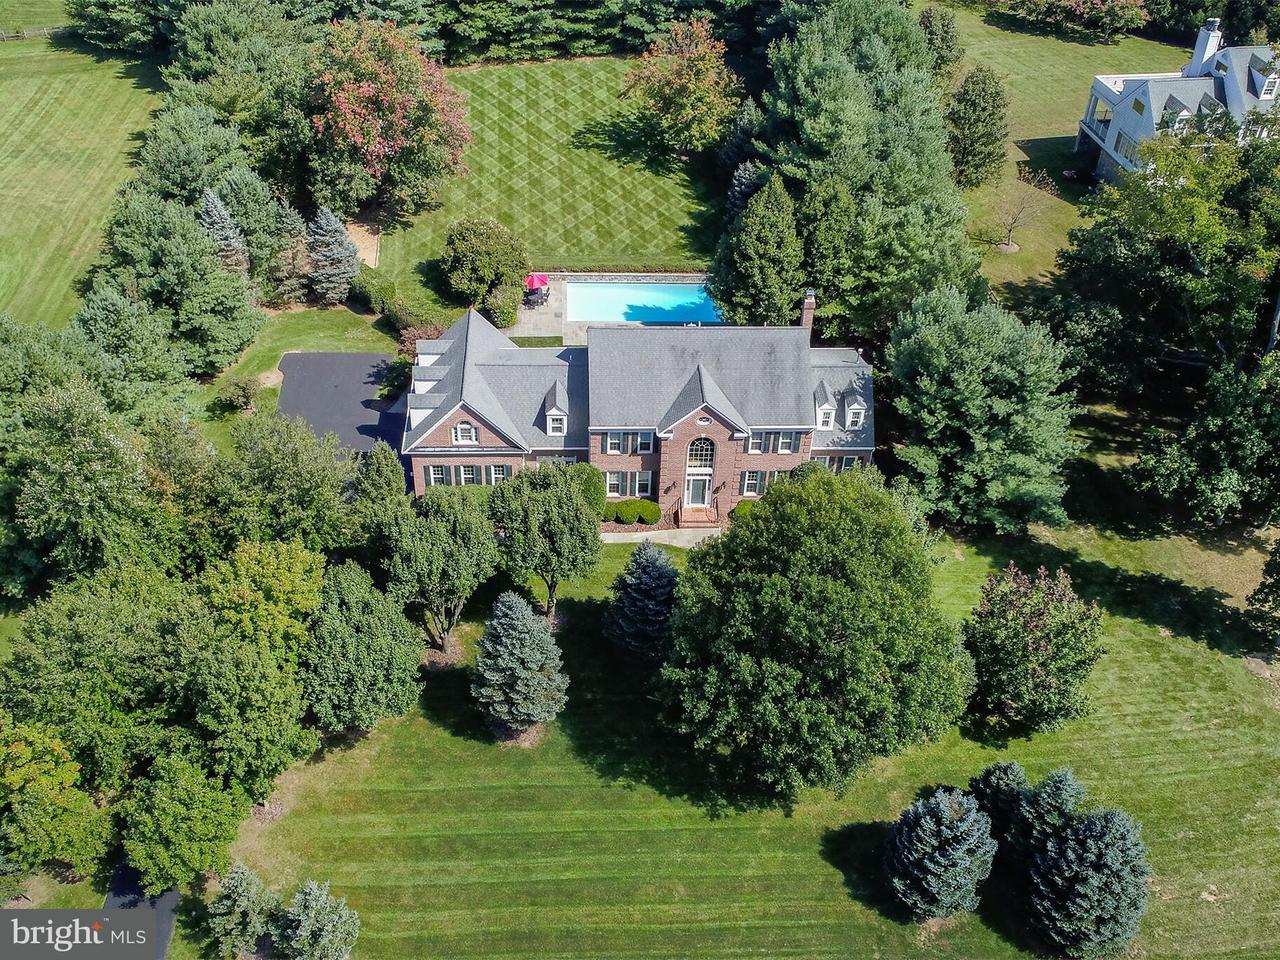 Single Family Home for Sale at 621 Nalls Farm Way 621 Nalls Farm Way Great Falls, Virginia 22066 United States